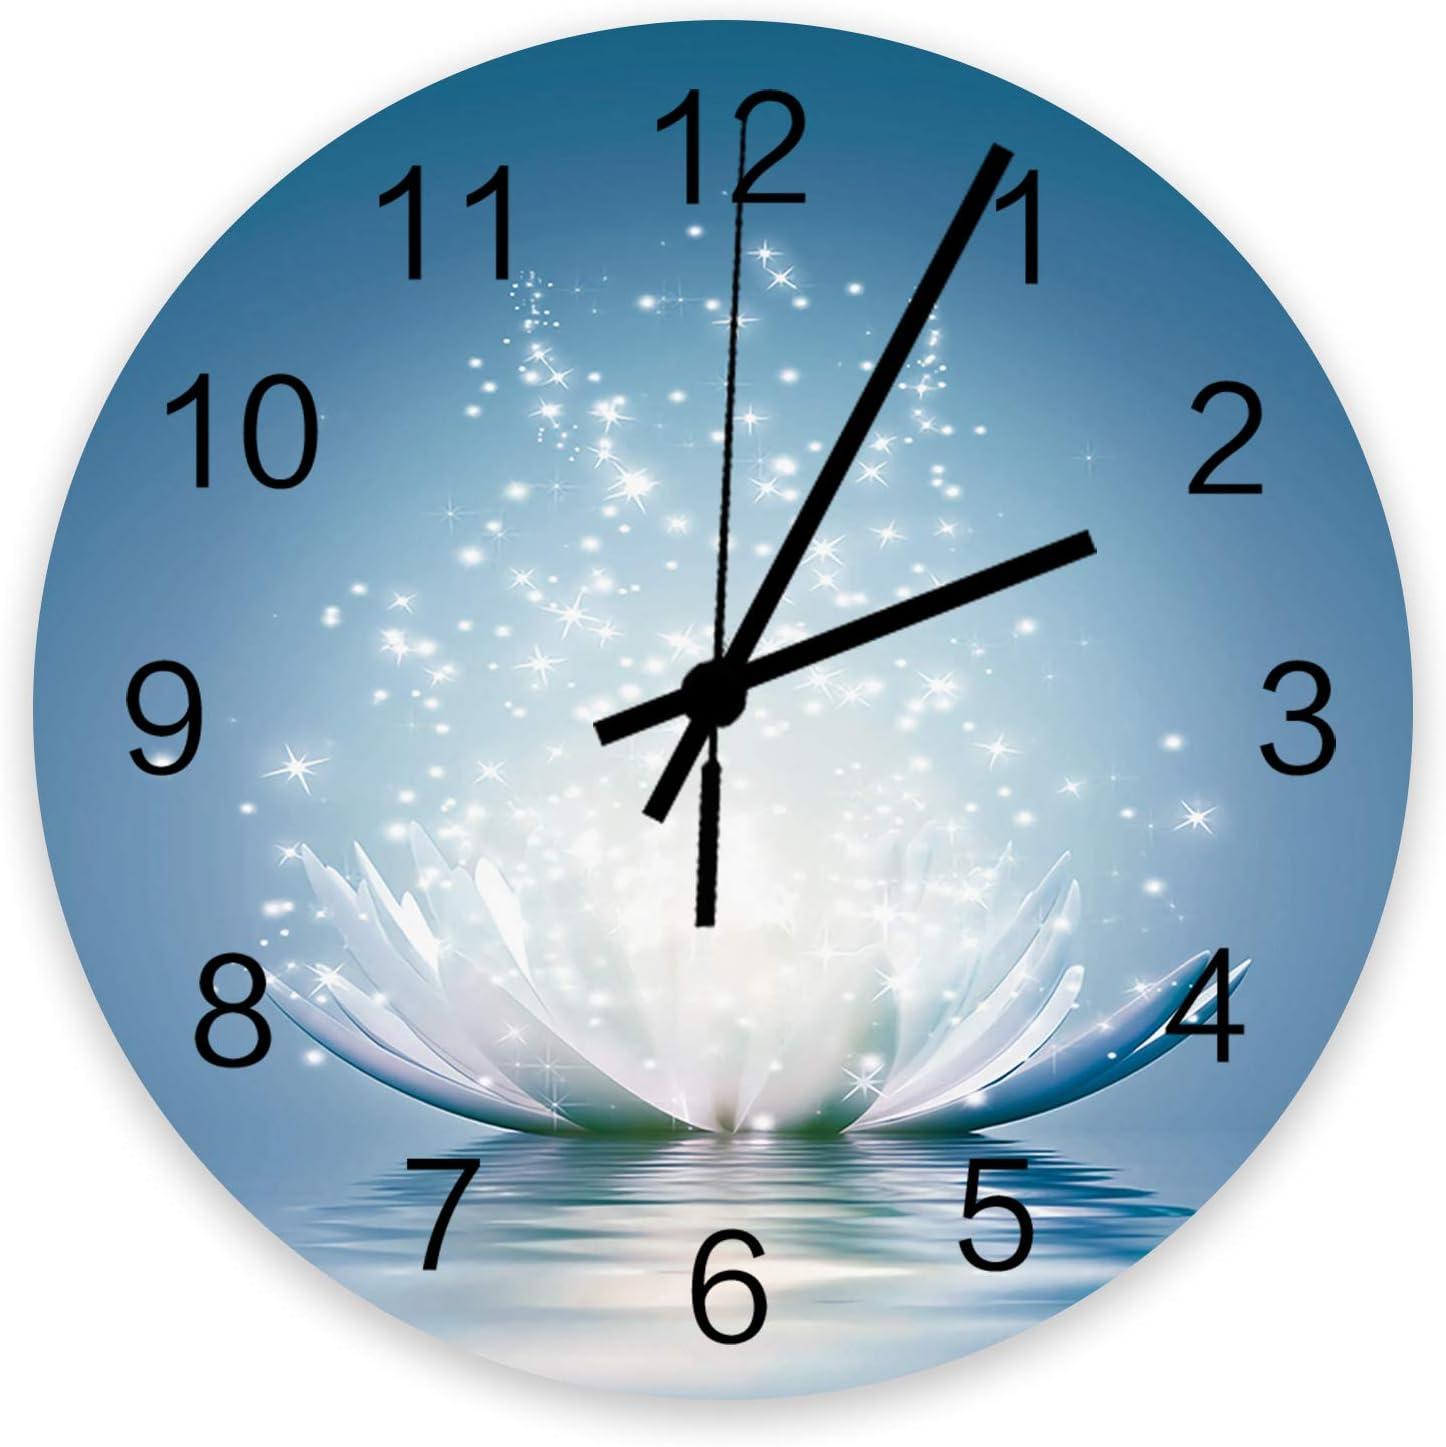 Wood Round Wall Ranking TOP11 Clock 12 Inch Silent Meditation Award Lotus N Glowing